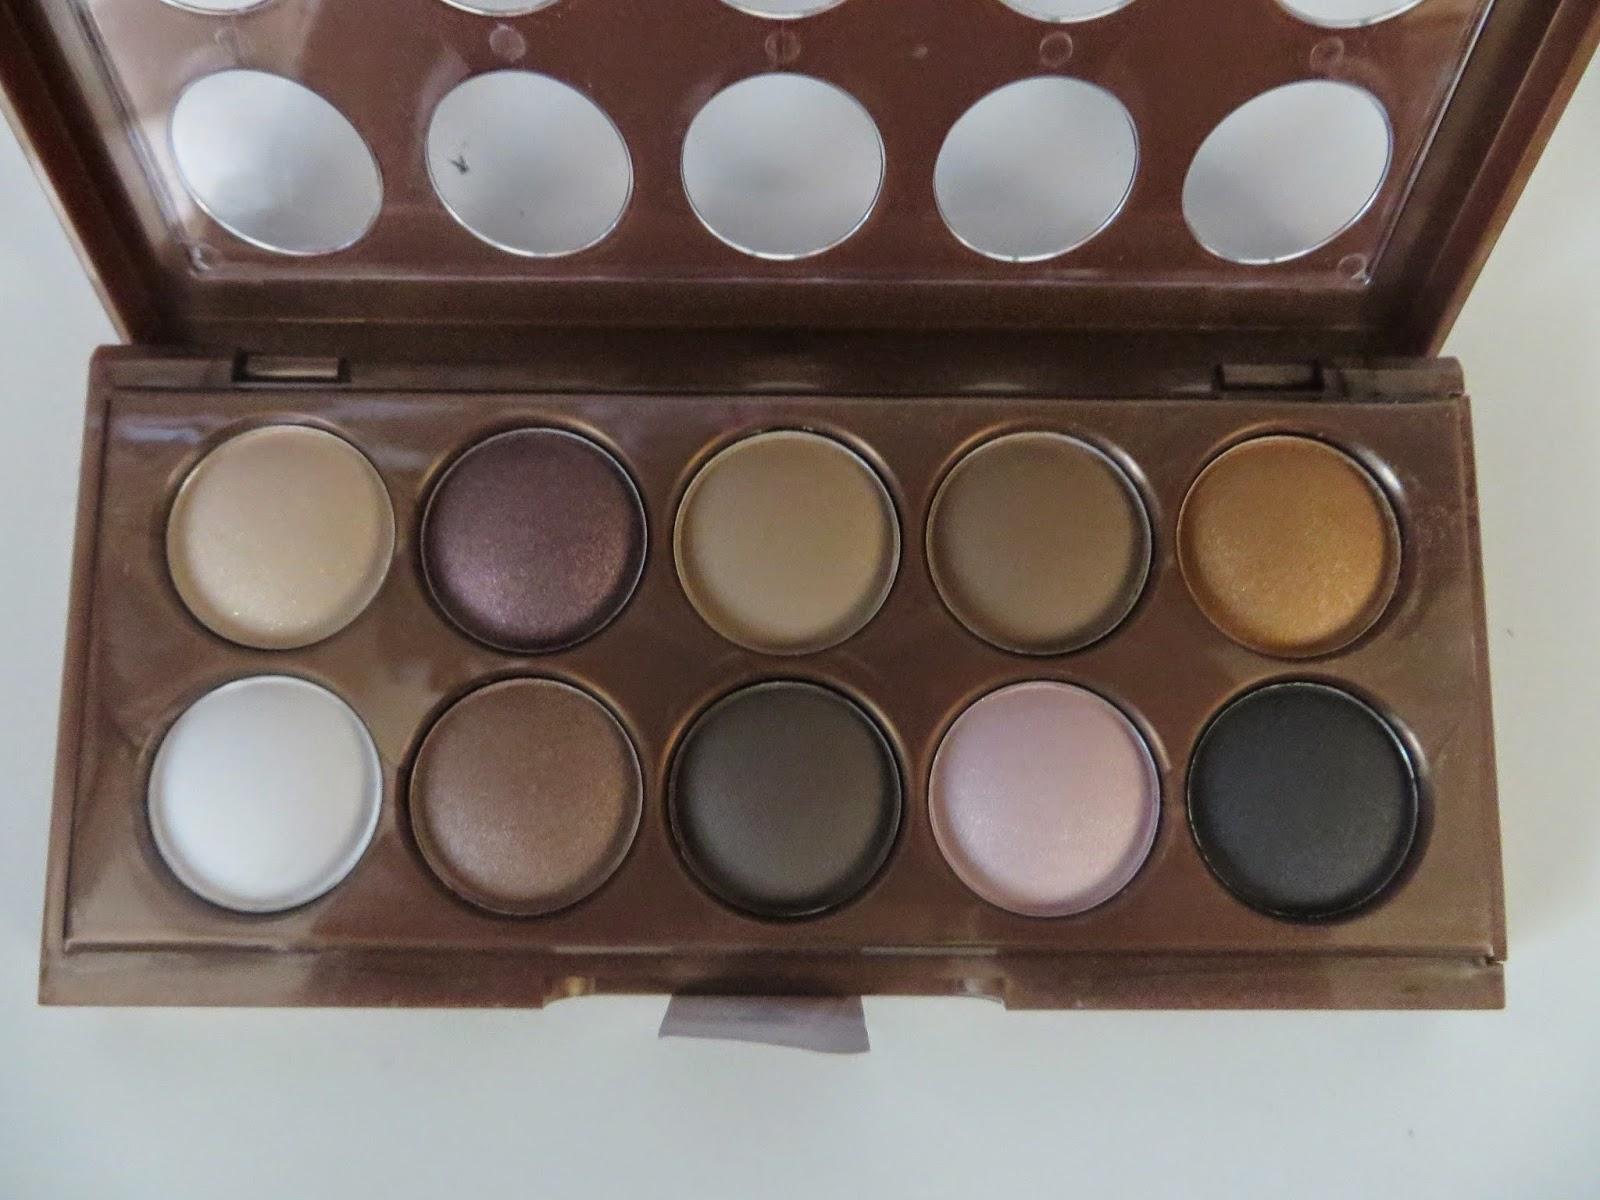 NYX Dream Catcher Eye Shadow Palette